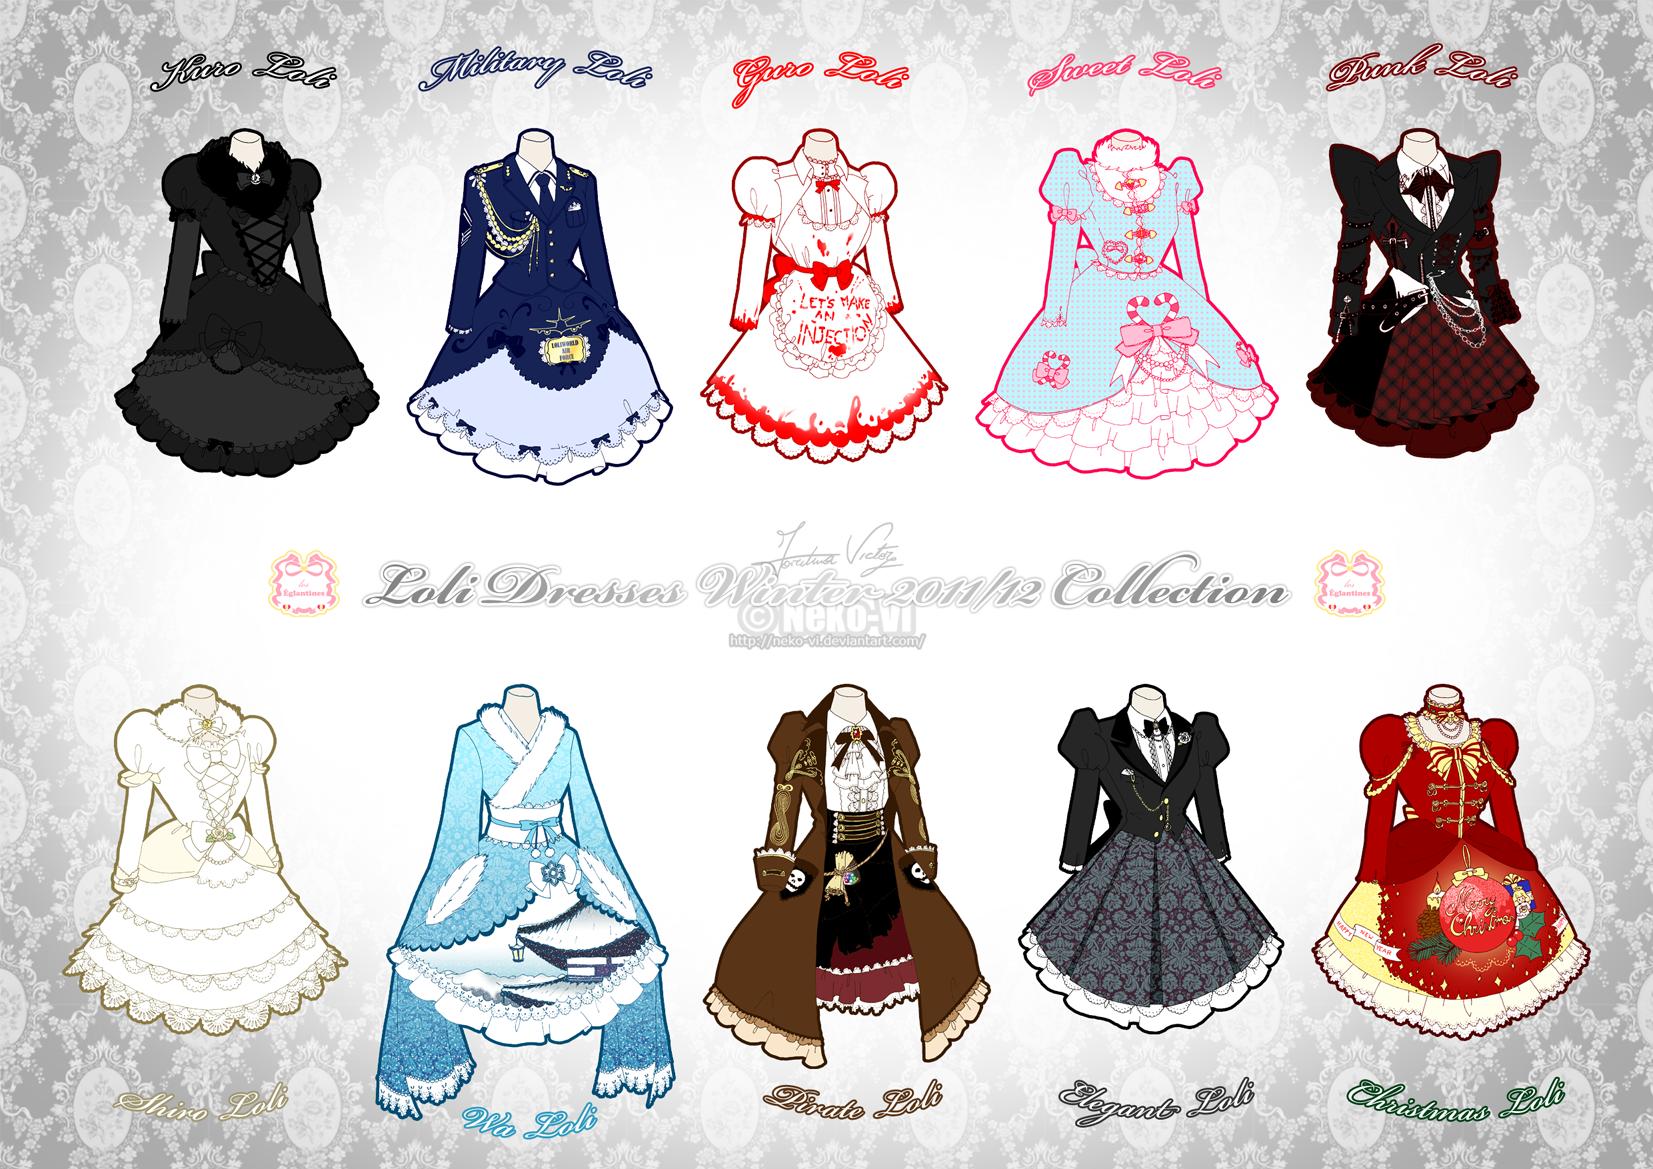 Lolita Winter 2011-12 Collection by Neko-Vi